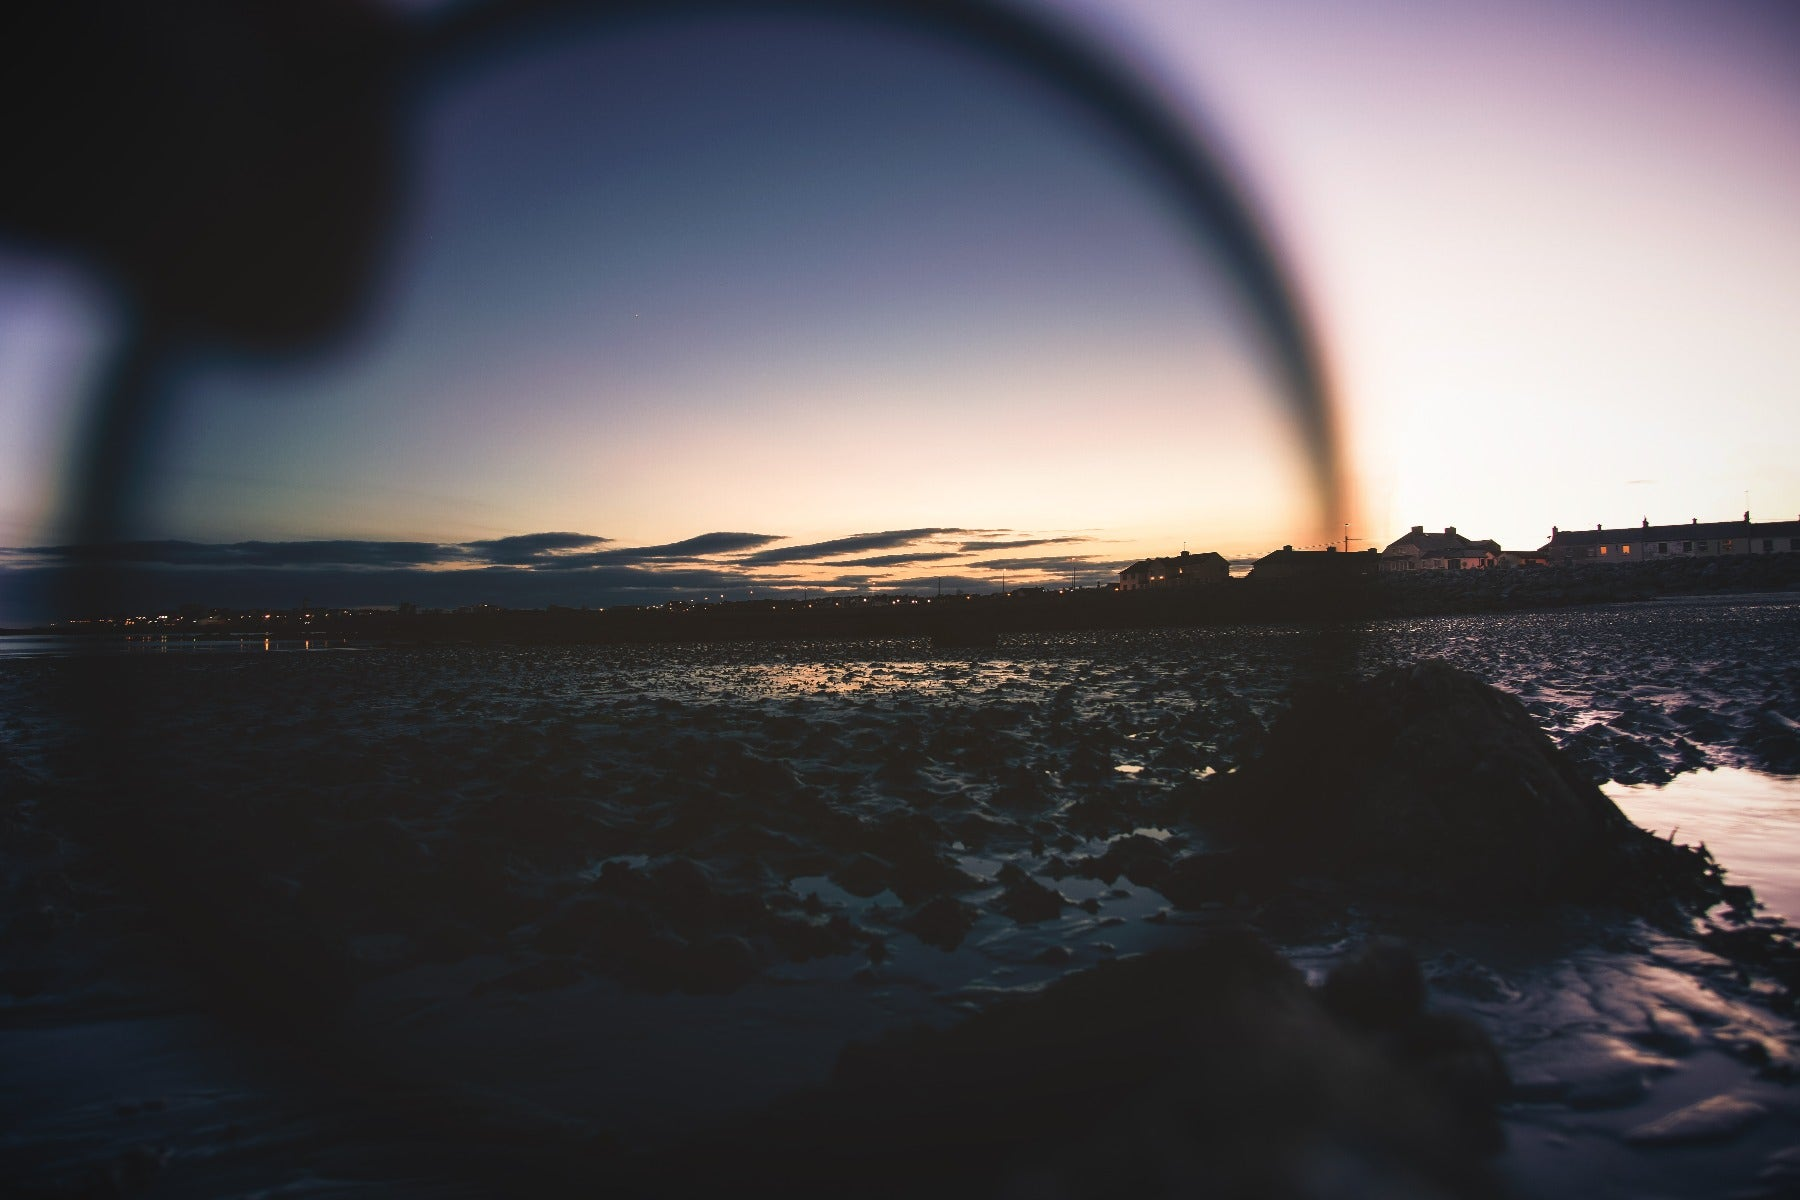 Polarising filter